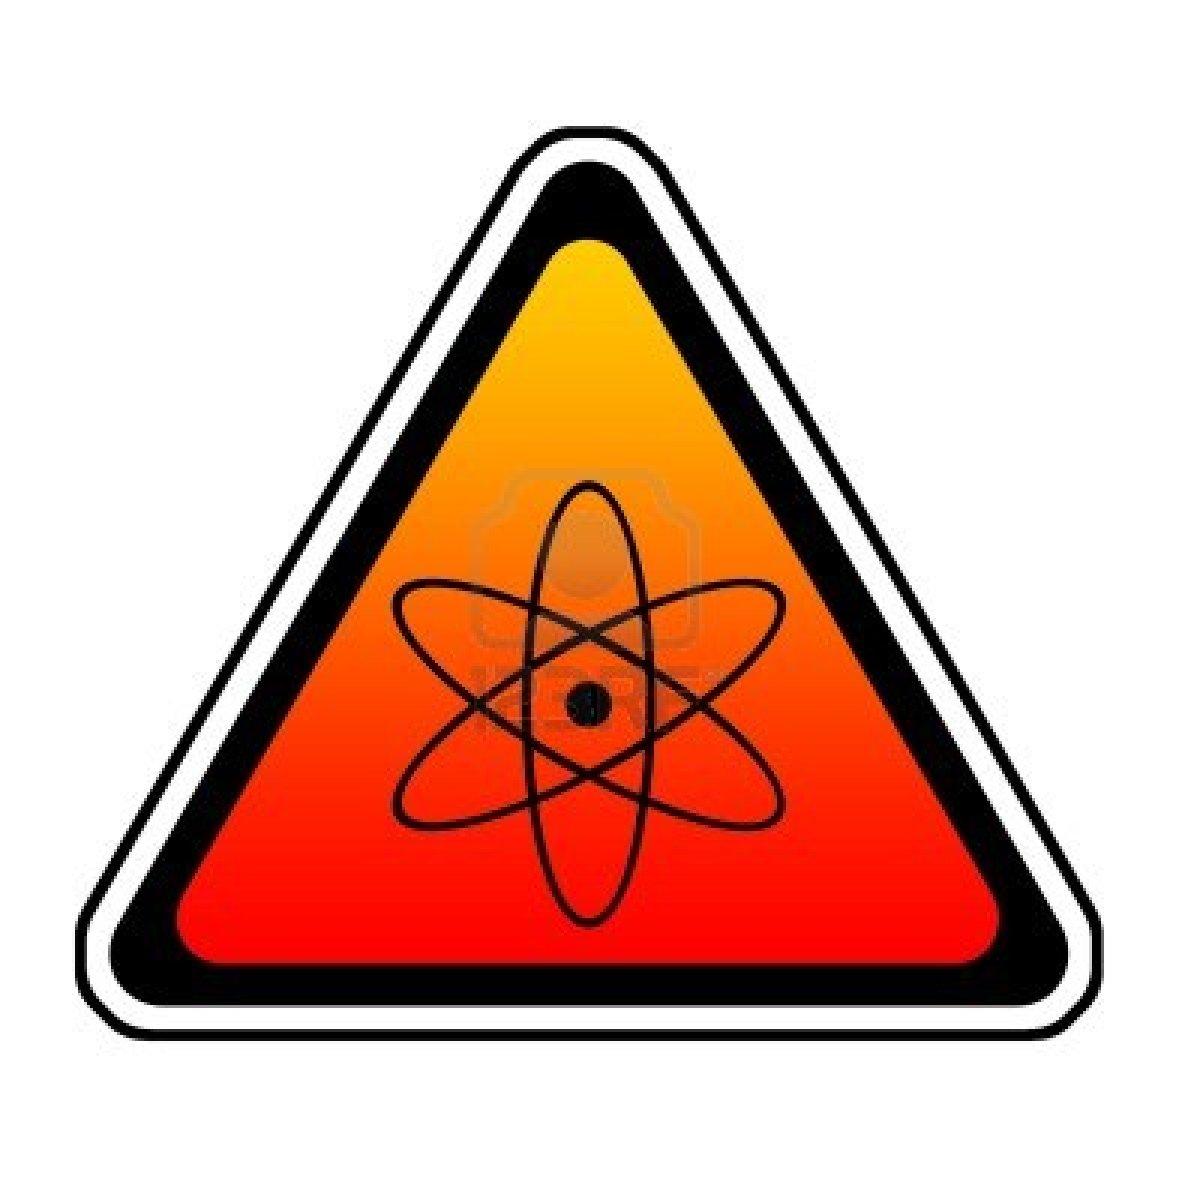 Dee finneys blog july 9 2013 page 529 radiation warning radiation warning symbol buycottarizona Image collections